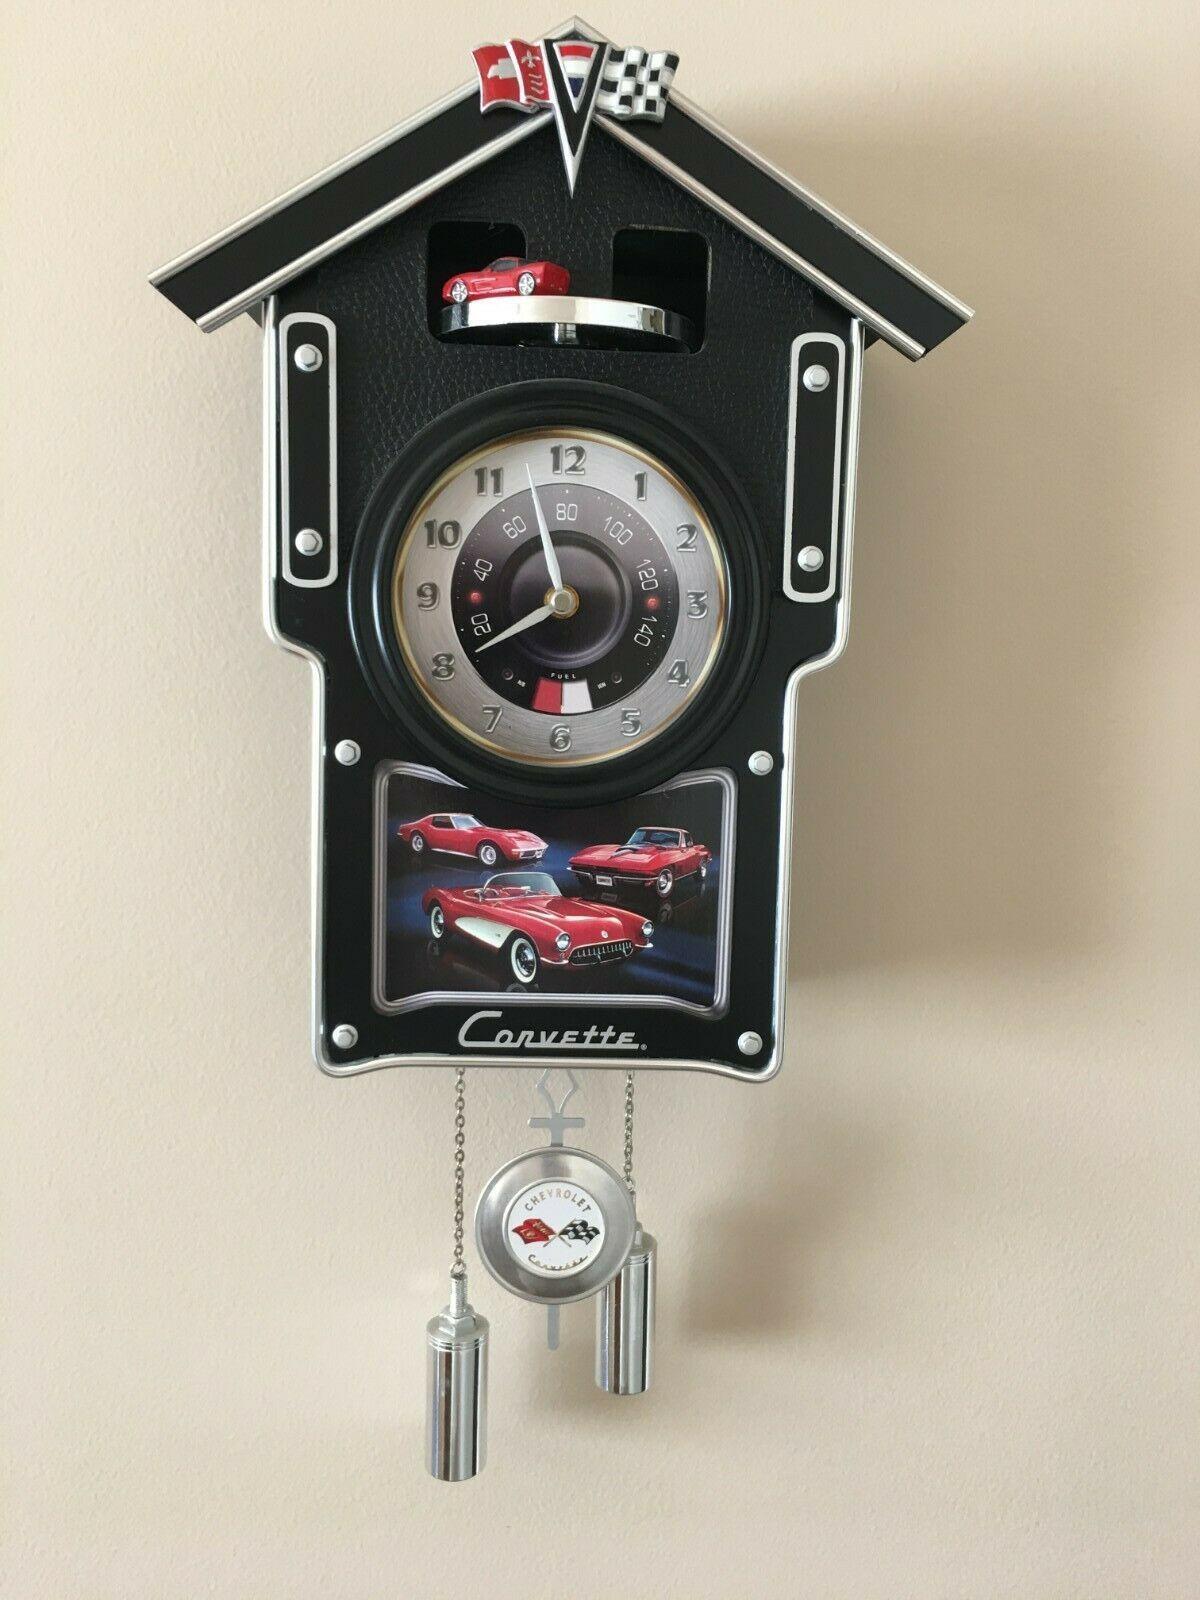 The Bradford Exchange Limited Edition Corvette Cuckoo Clock Still In The Box In 2020 Cuckoo Clock Clock Antique Radio